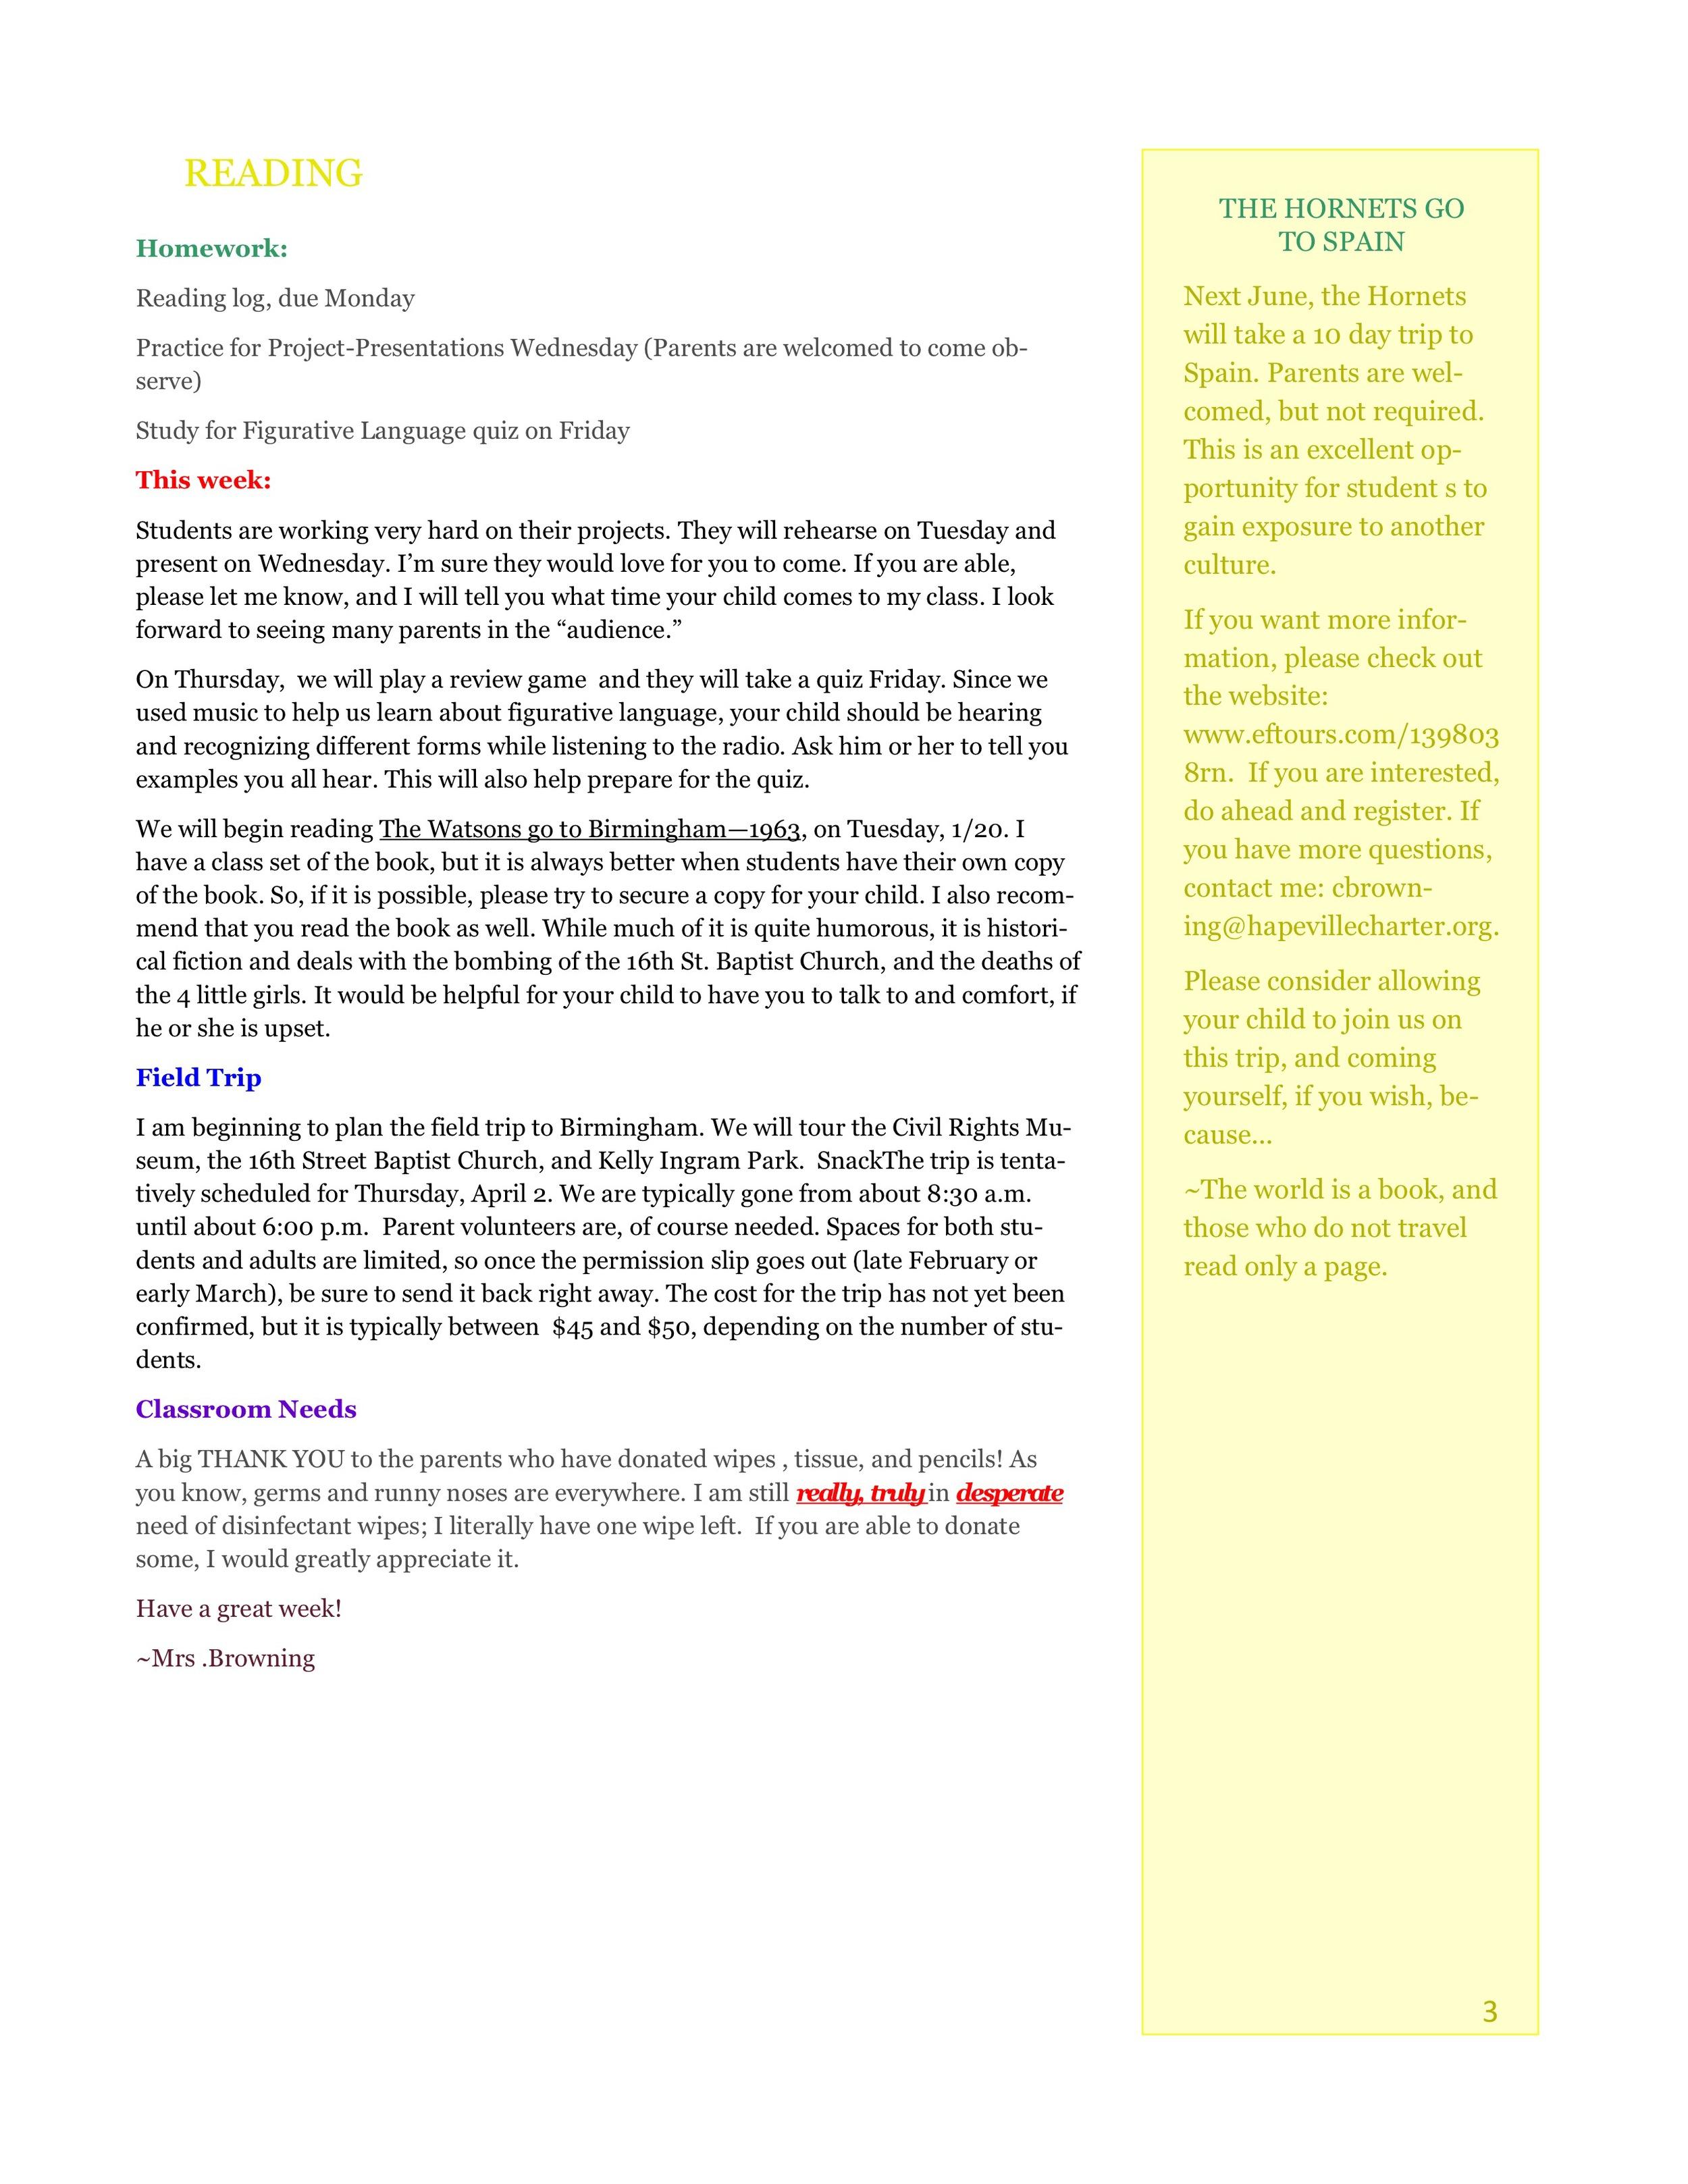 Newsletter Image6th grade January 12-16 3.jpeg